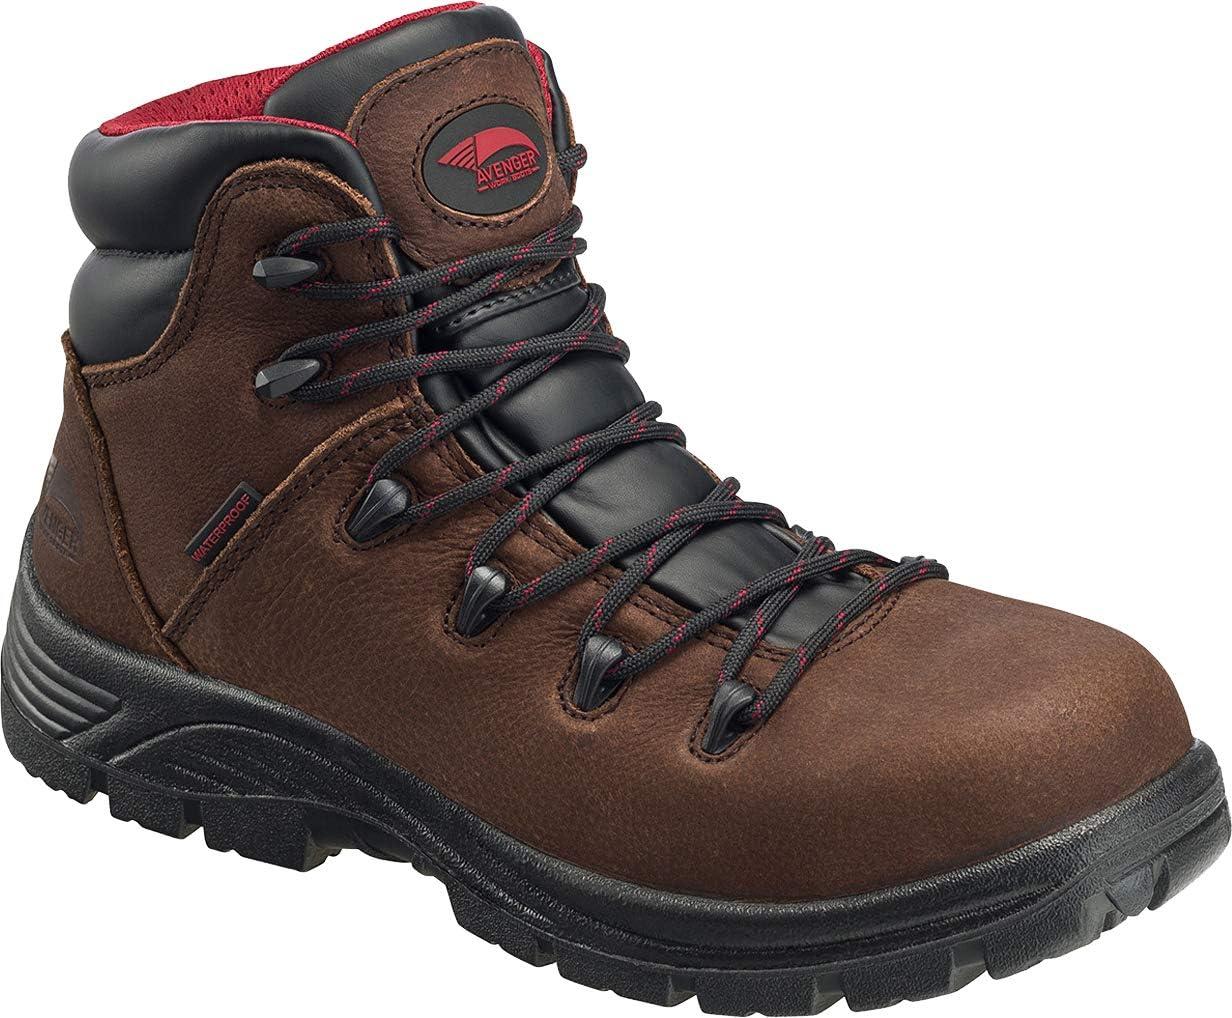 "FSI Avenger 6"" Leather Comp Toe Waterproof Puncture Resistant EH Slip Resistant Hiker, Brown, 13 Medium"